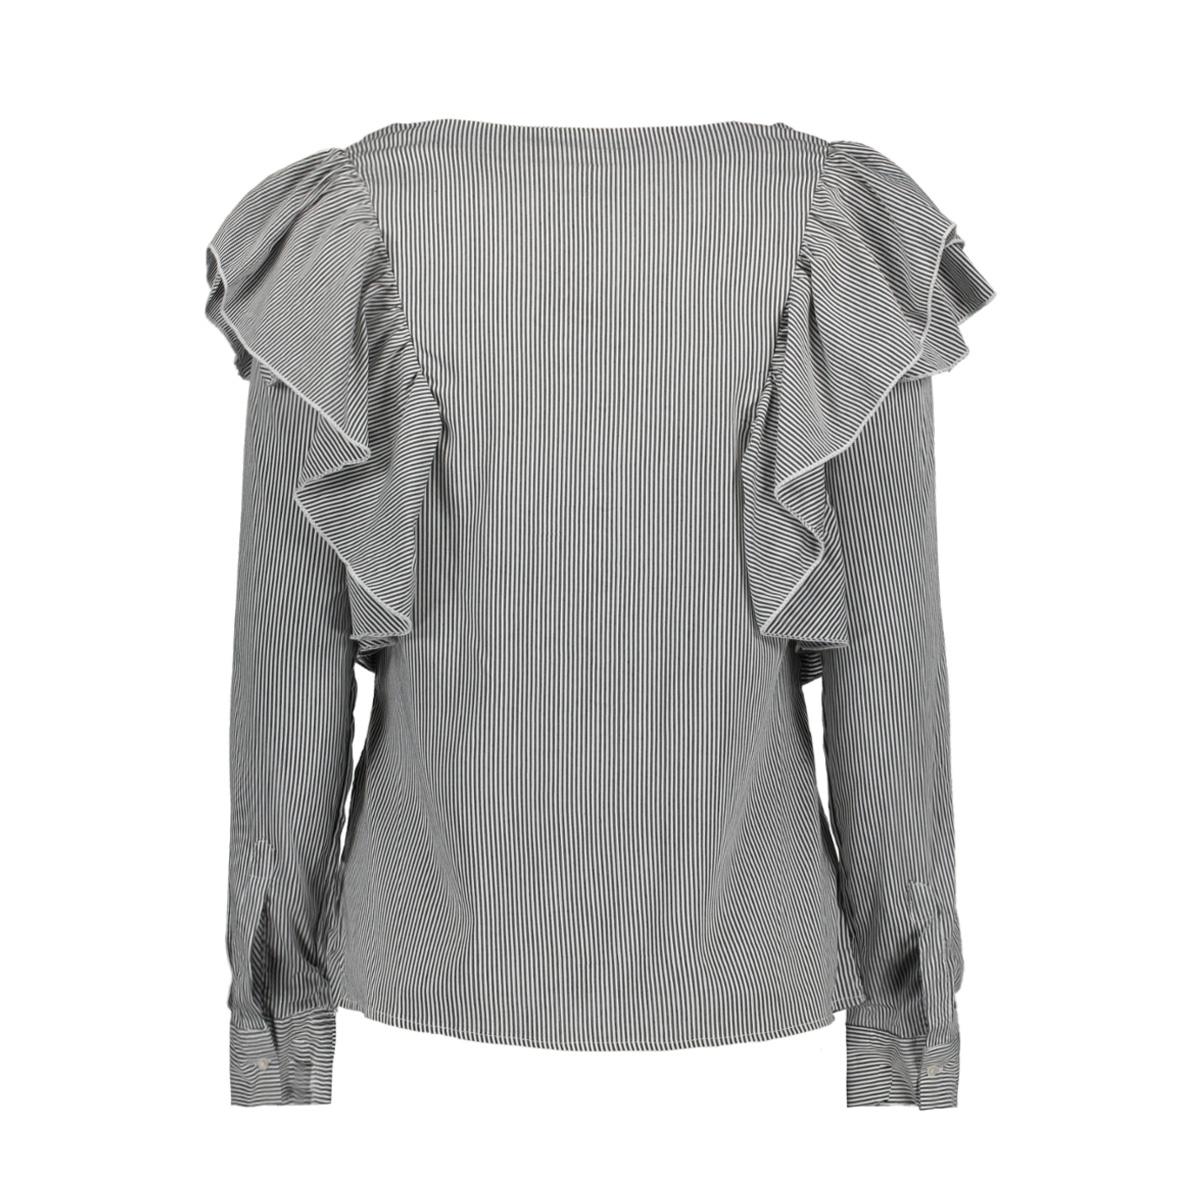 vmerika flounce l/s top sb8 10193604 vero moda blouse snow white/ black